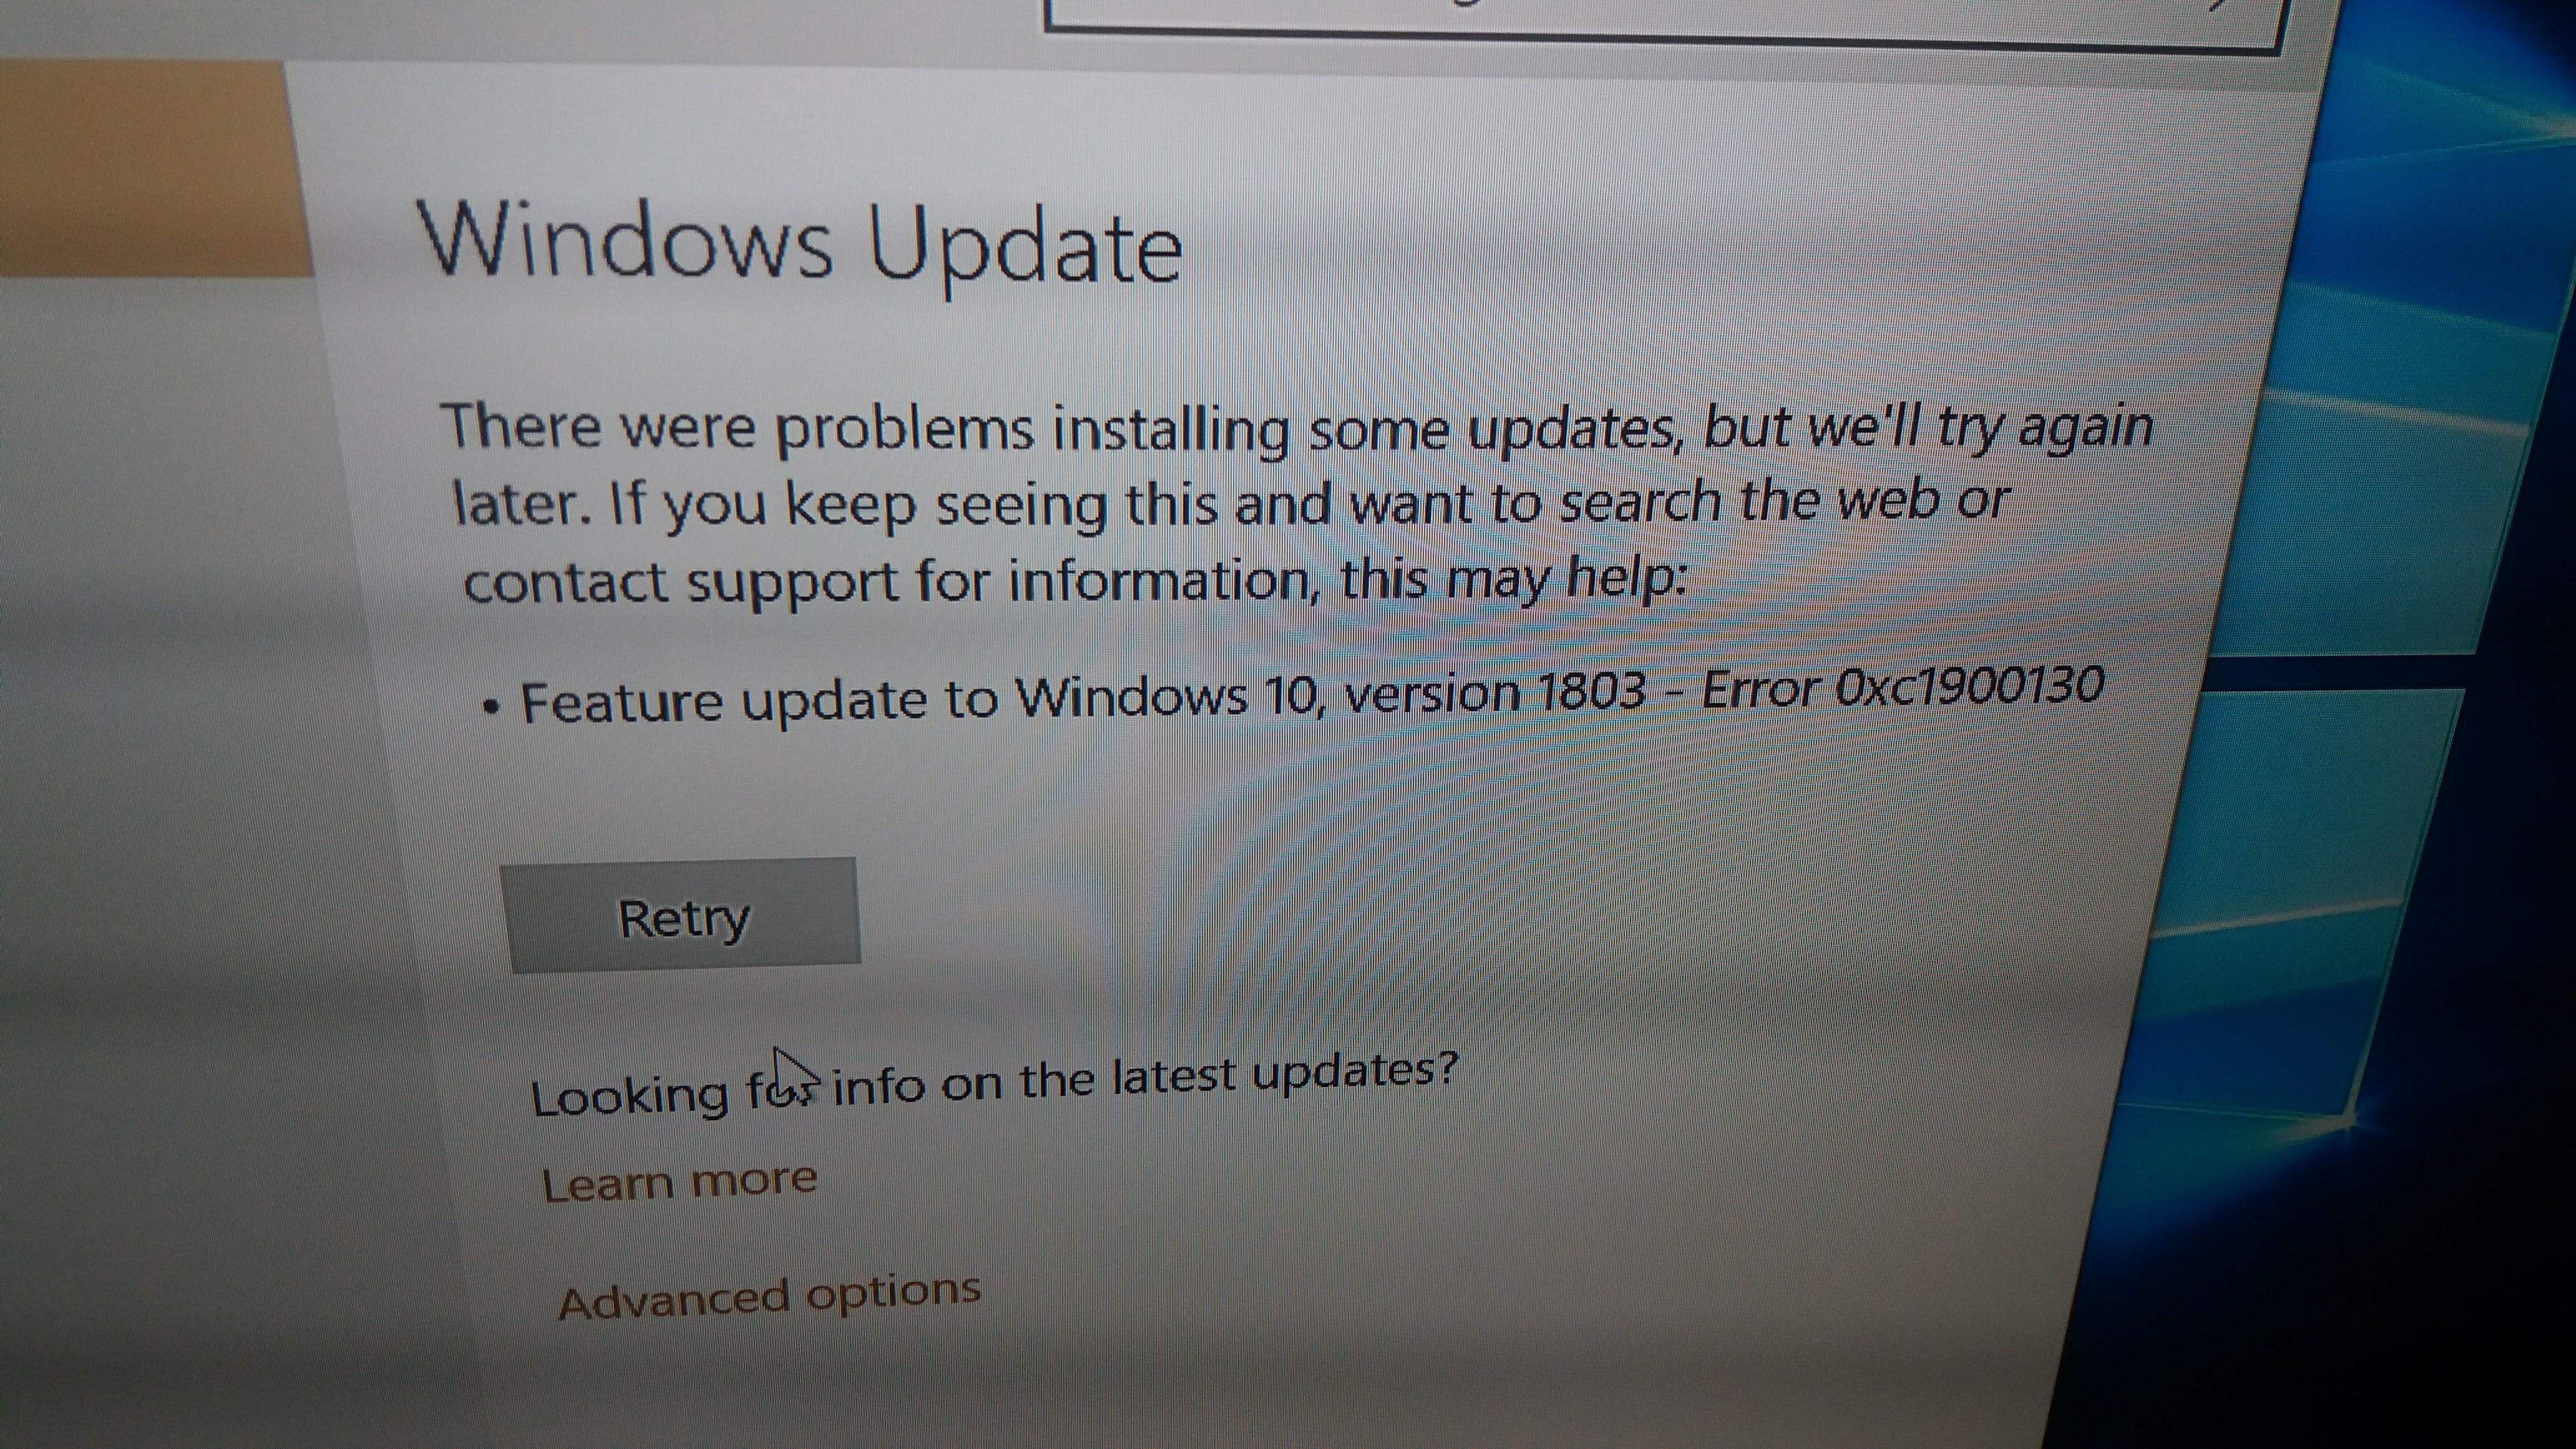 win 10 - 1803 update - wireless sdio driver not compatible - error